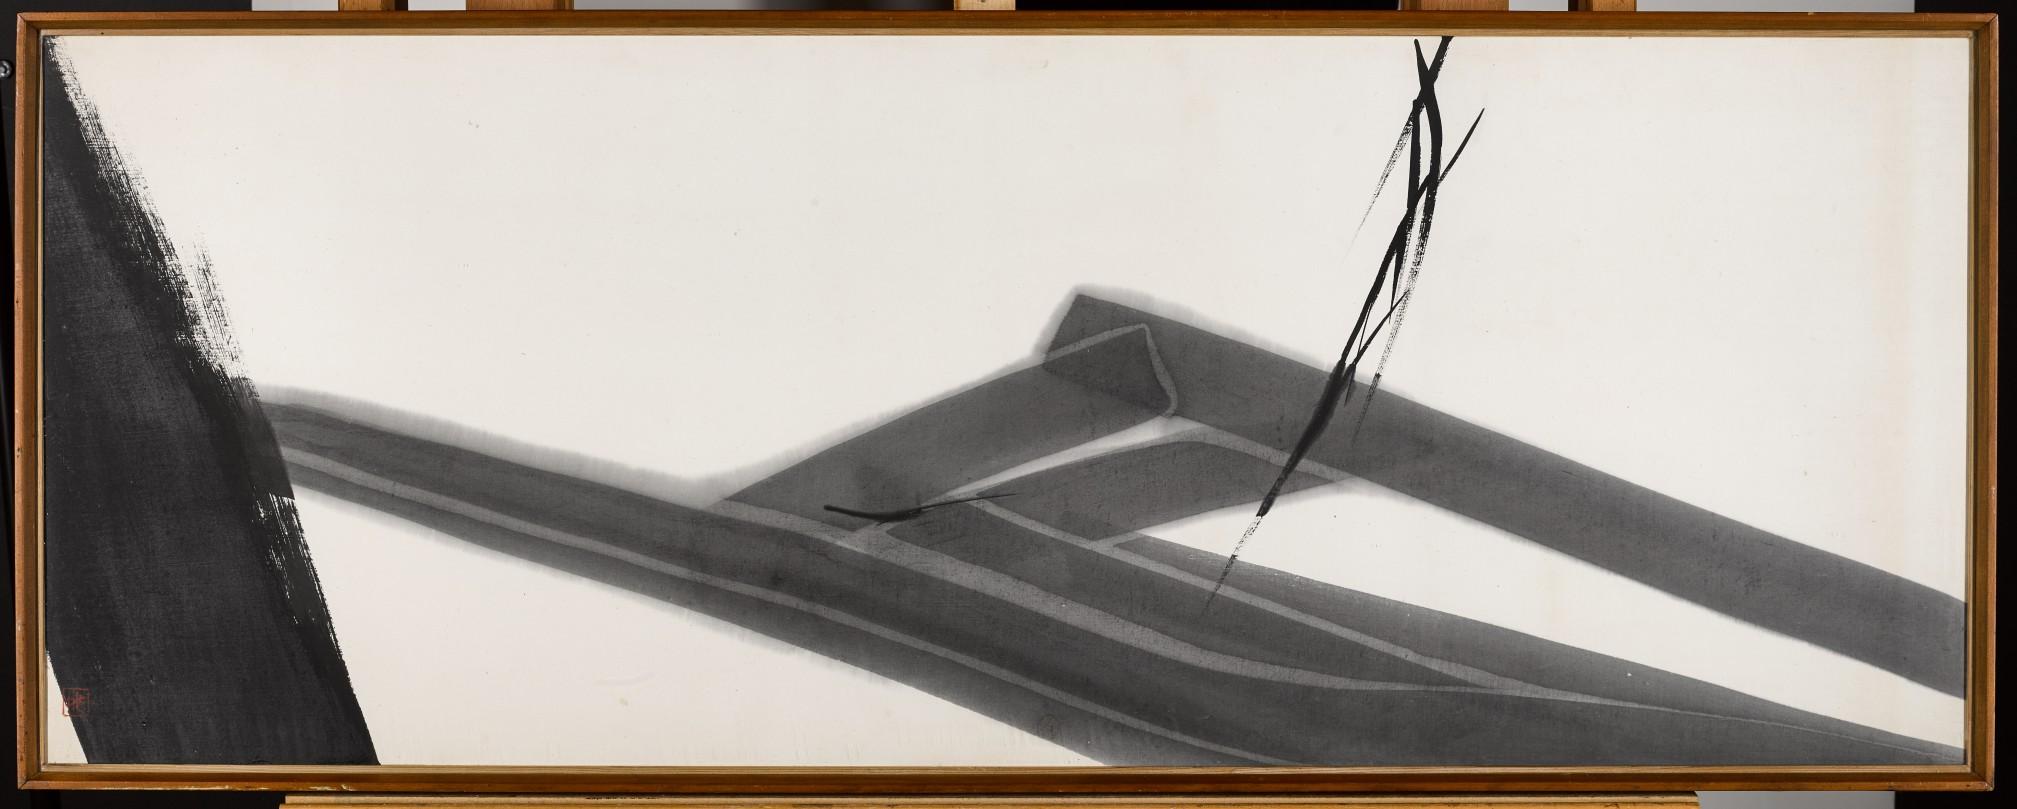 Toko Shinoda (b.1913), Genji, 1967, Showa Period, sumi ink on canvas, signed Toko Shinoda 1967, 139 x 55 cm (framed)